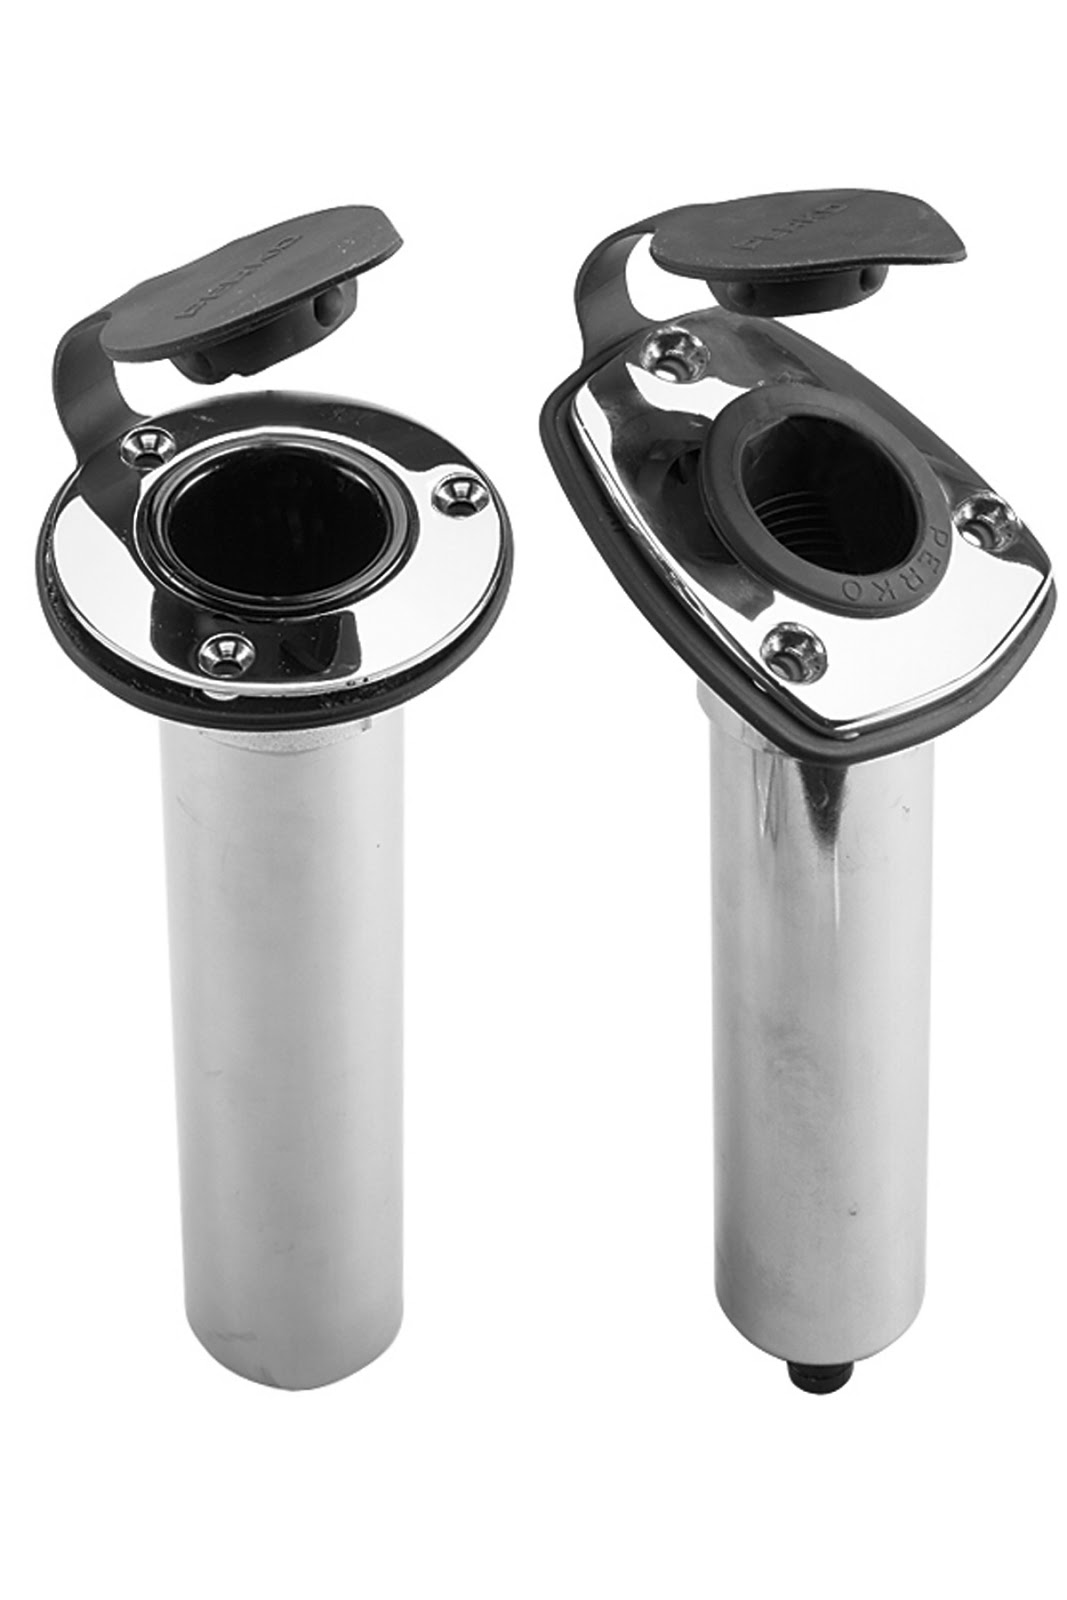 Stainless steel rod holders